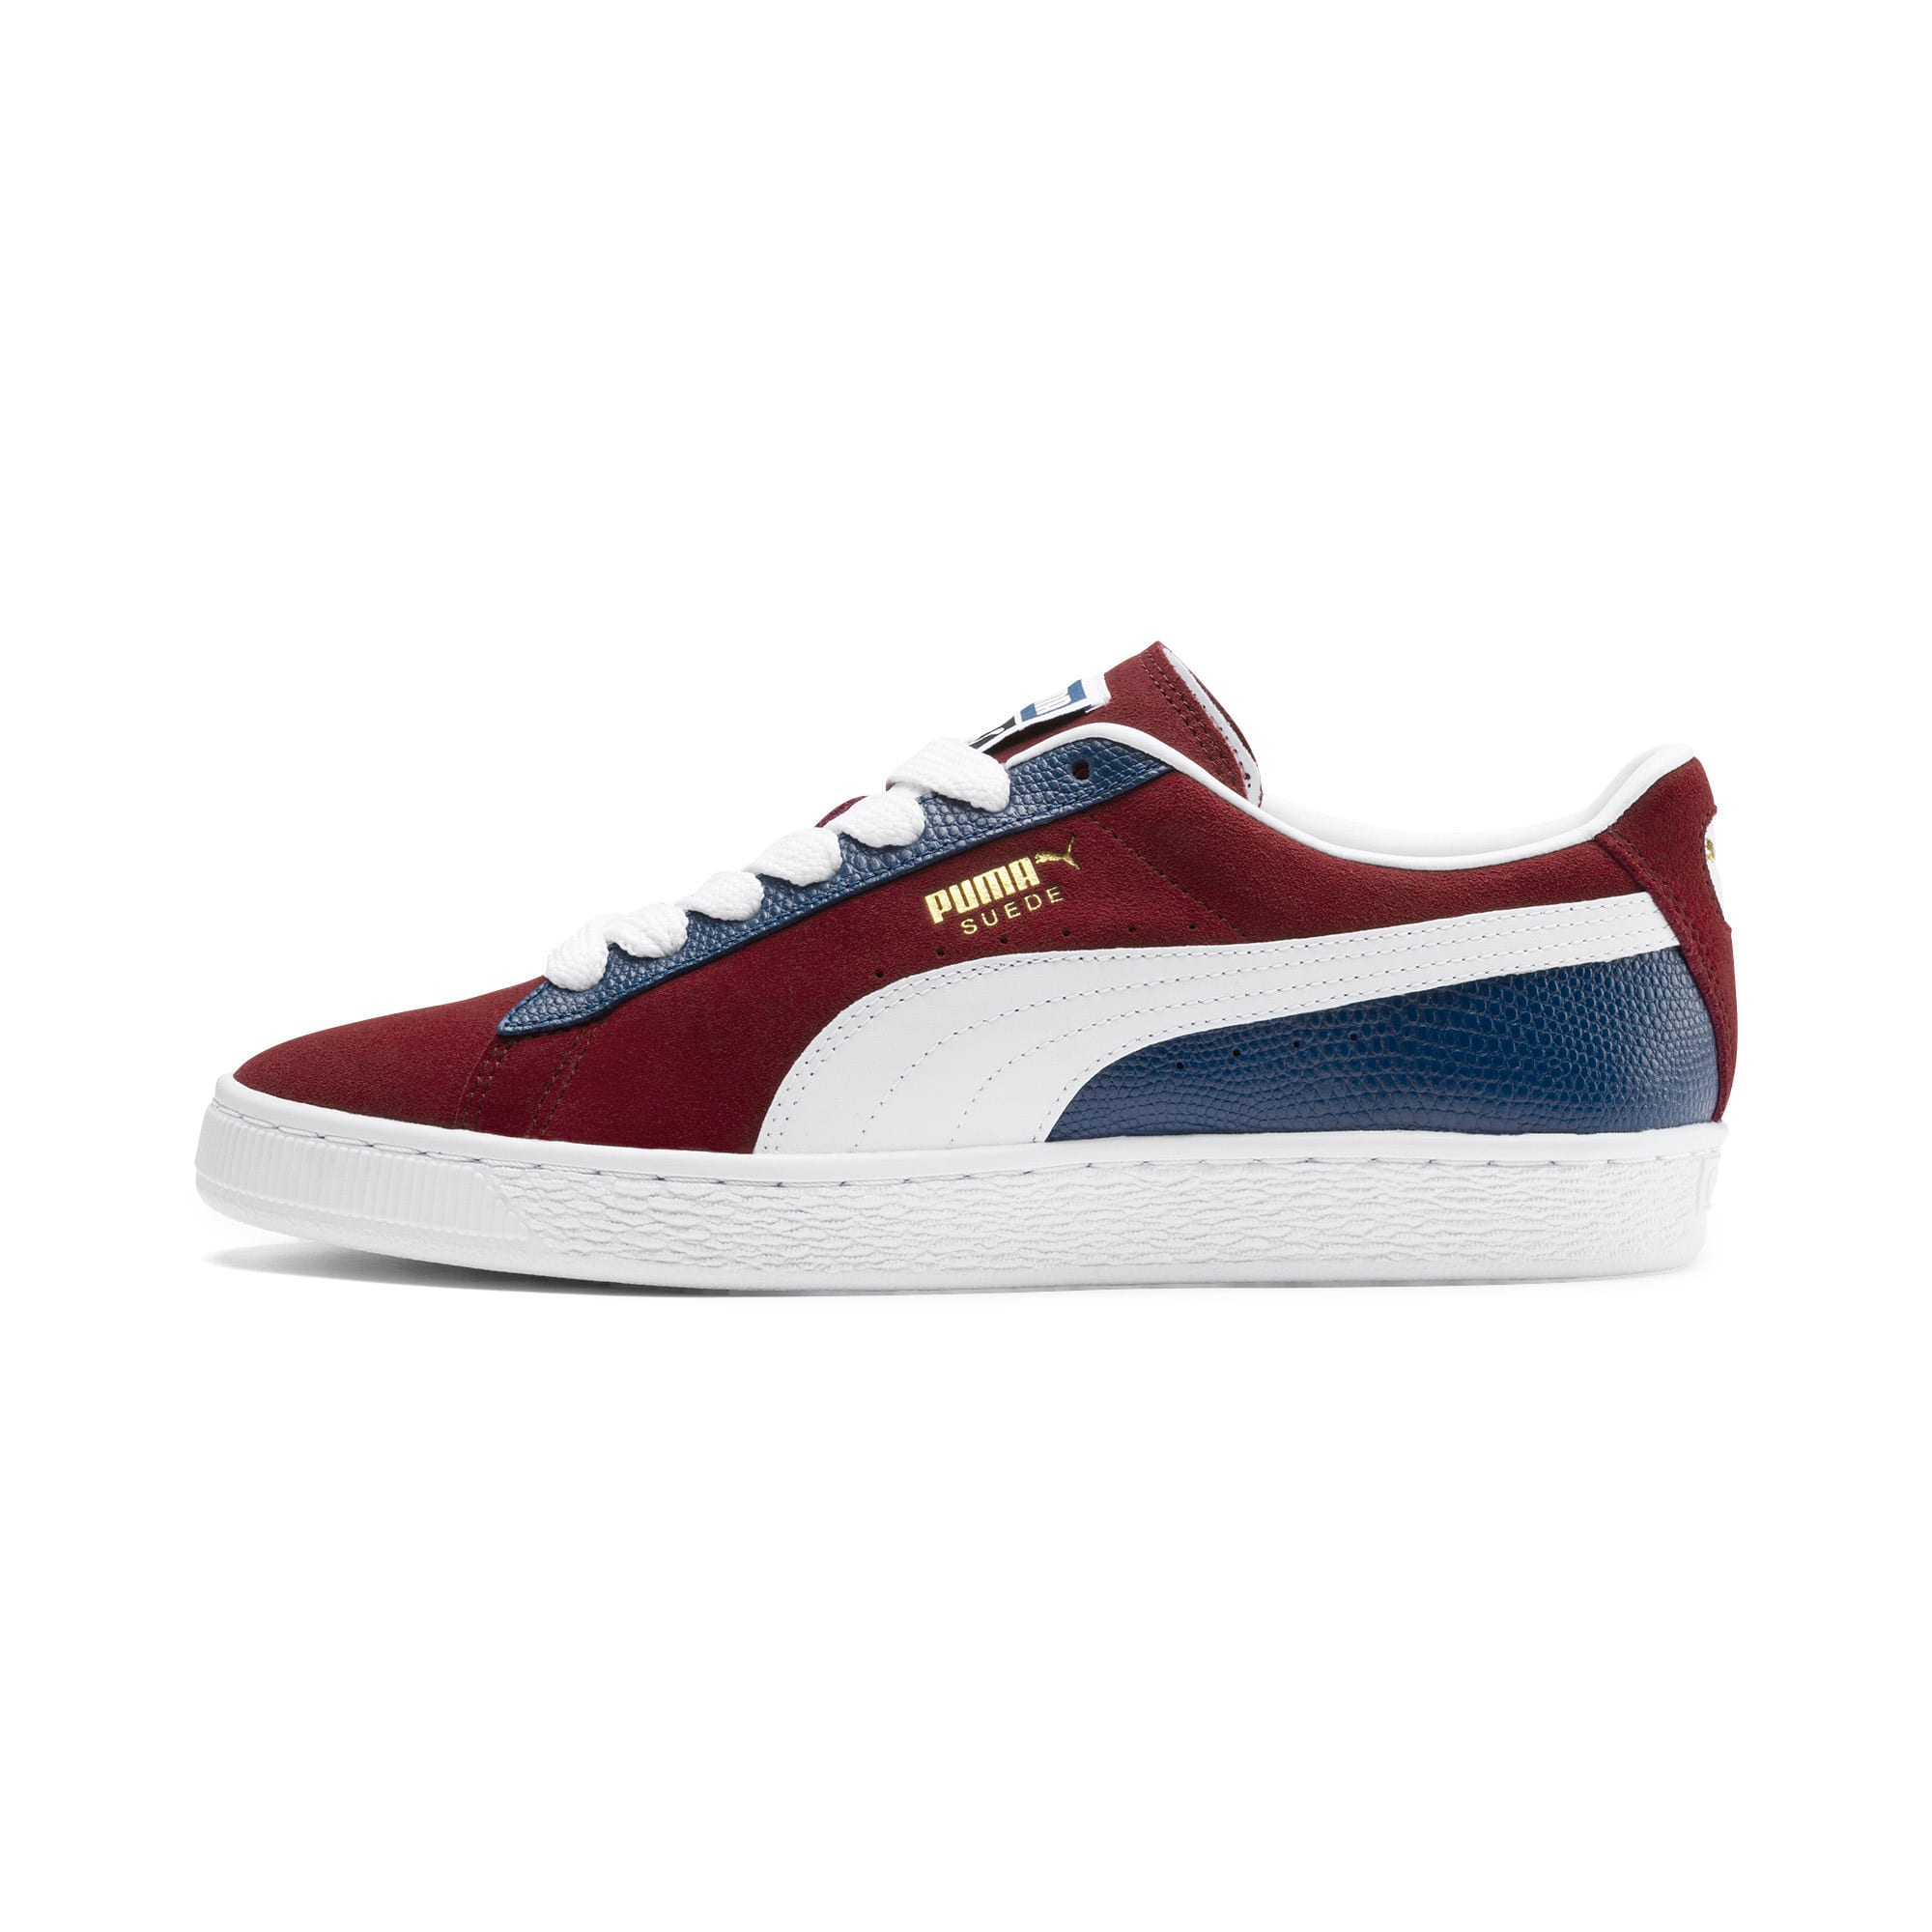 Thumbnail 1 of Suede Classic Block Sneakers, Rhubarb- Blue-White, medium